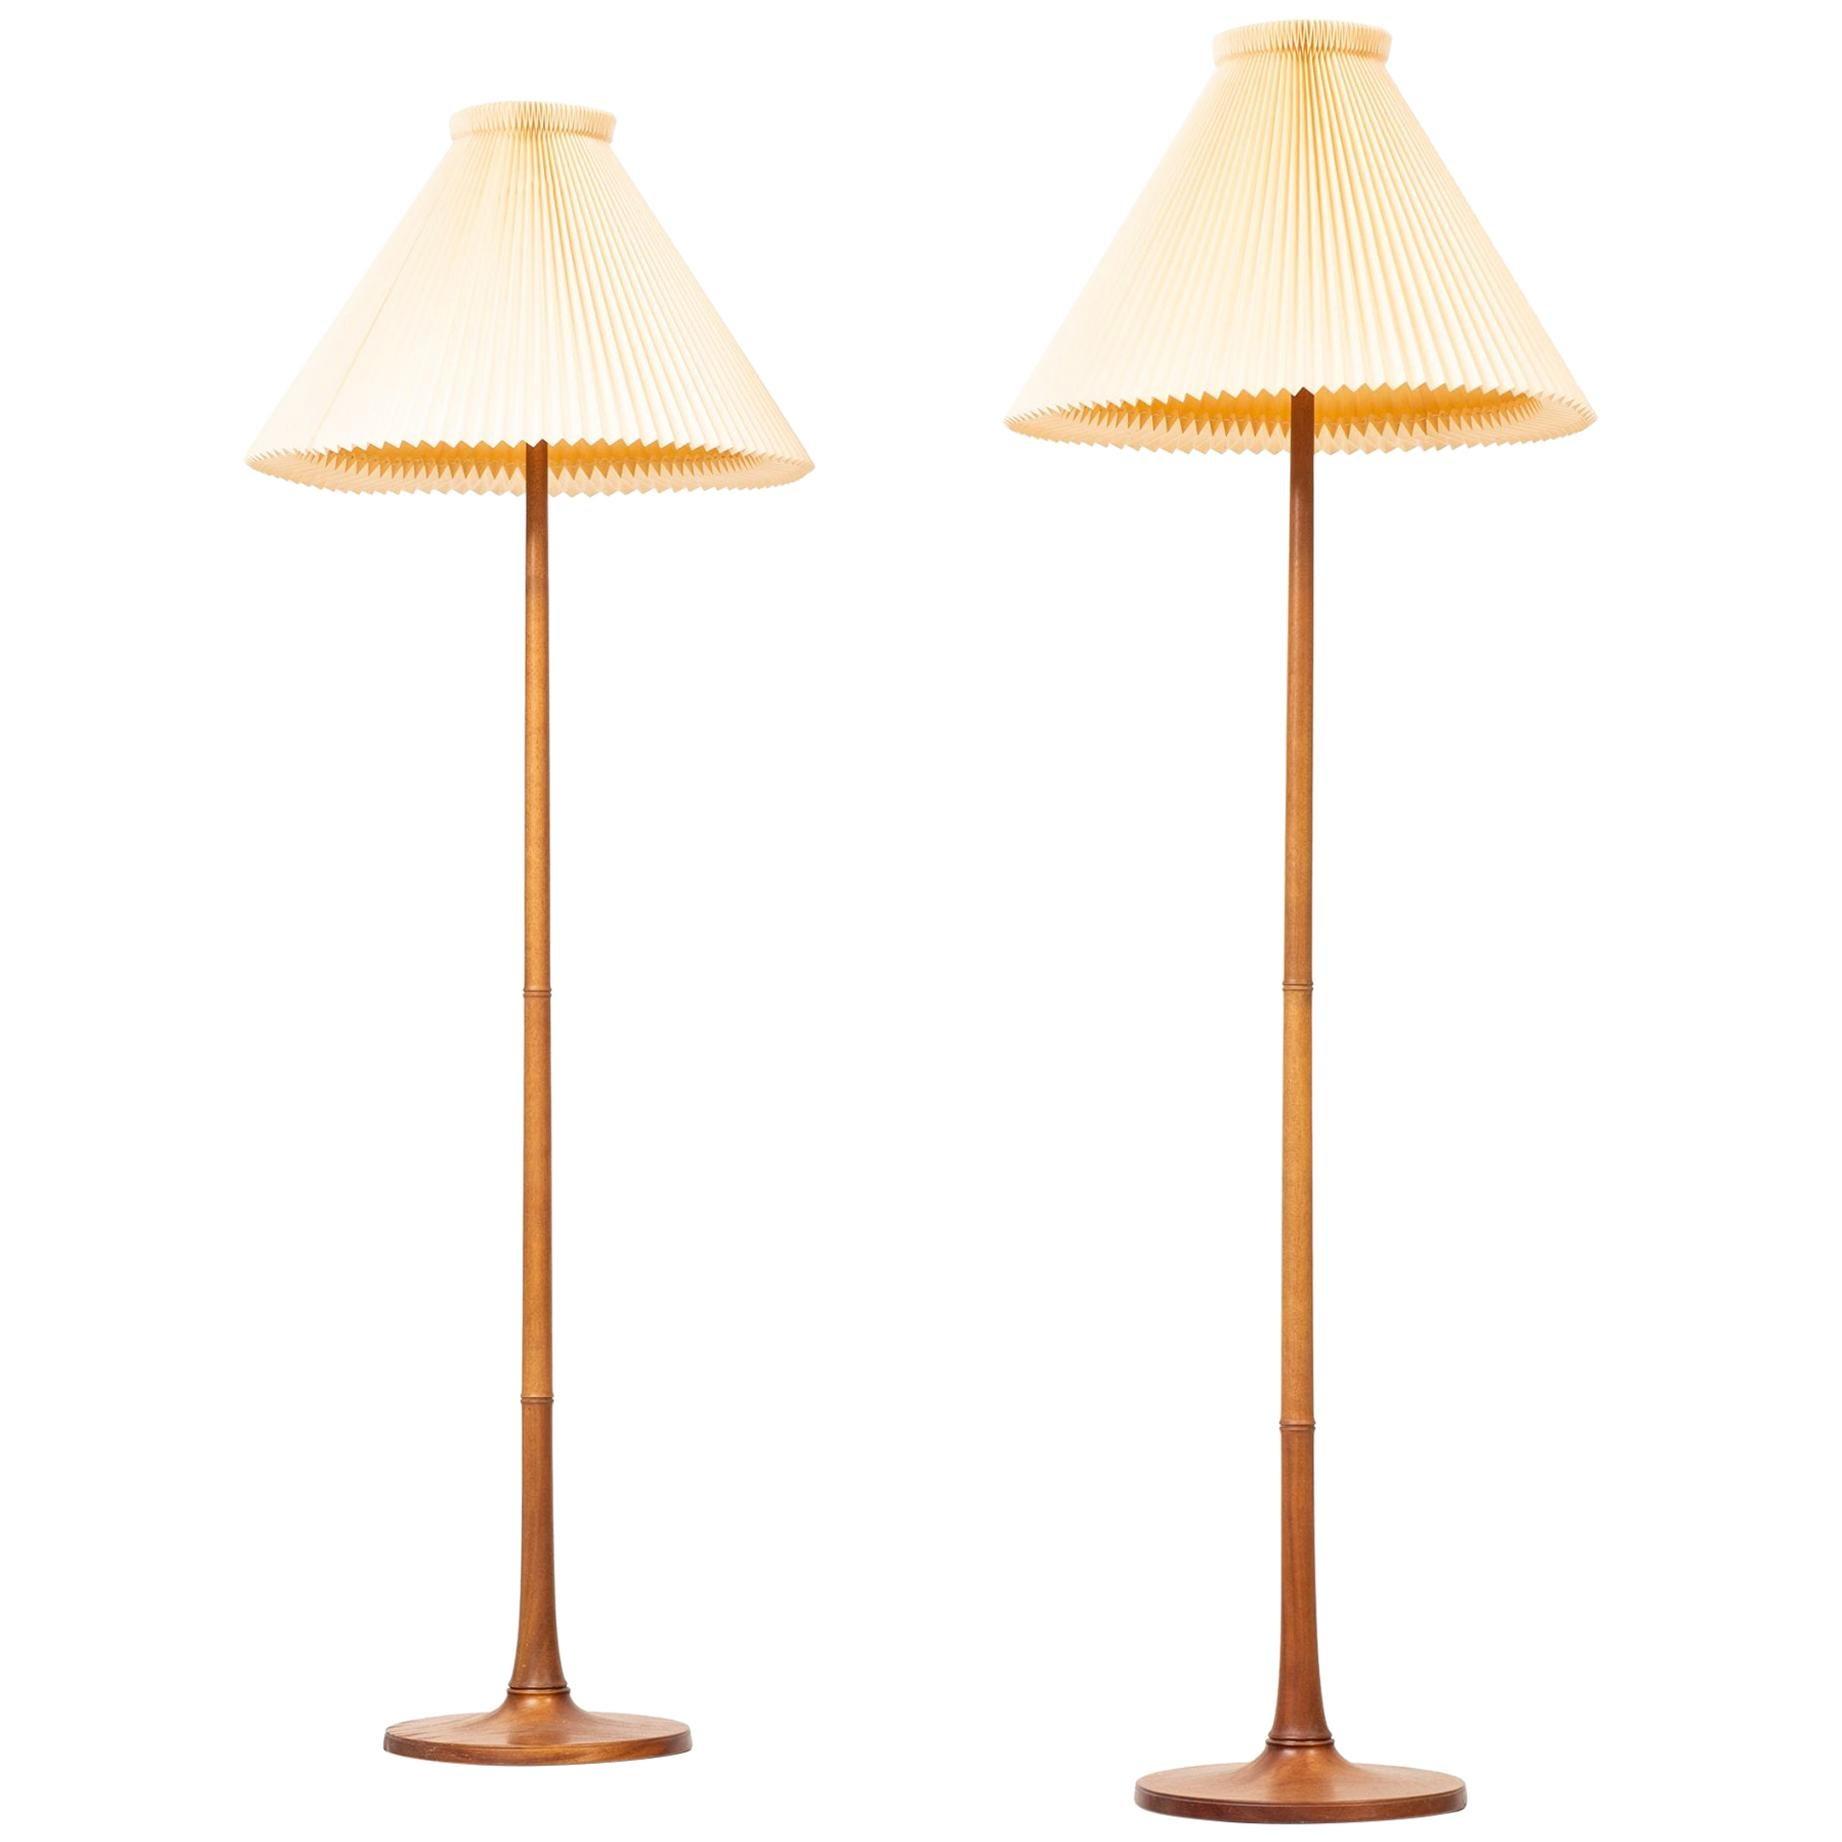 Floor Lamps Produced in Denmark